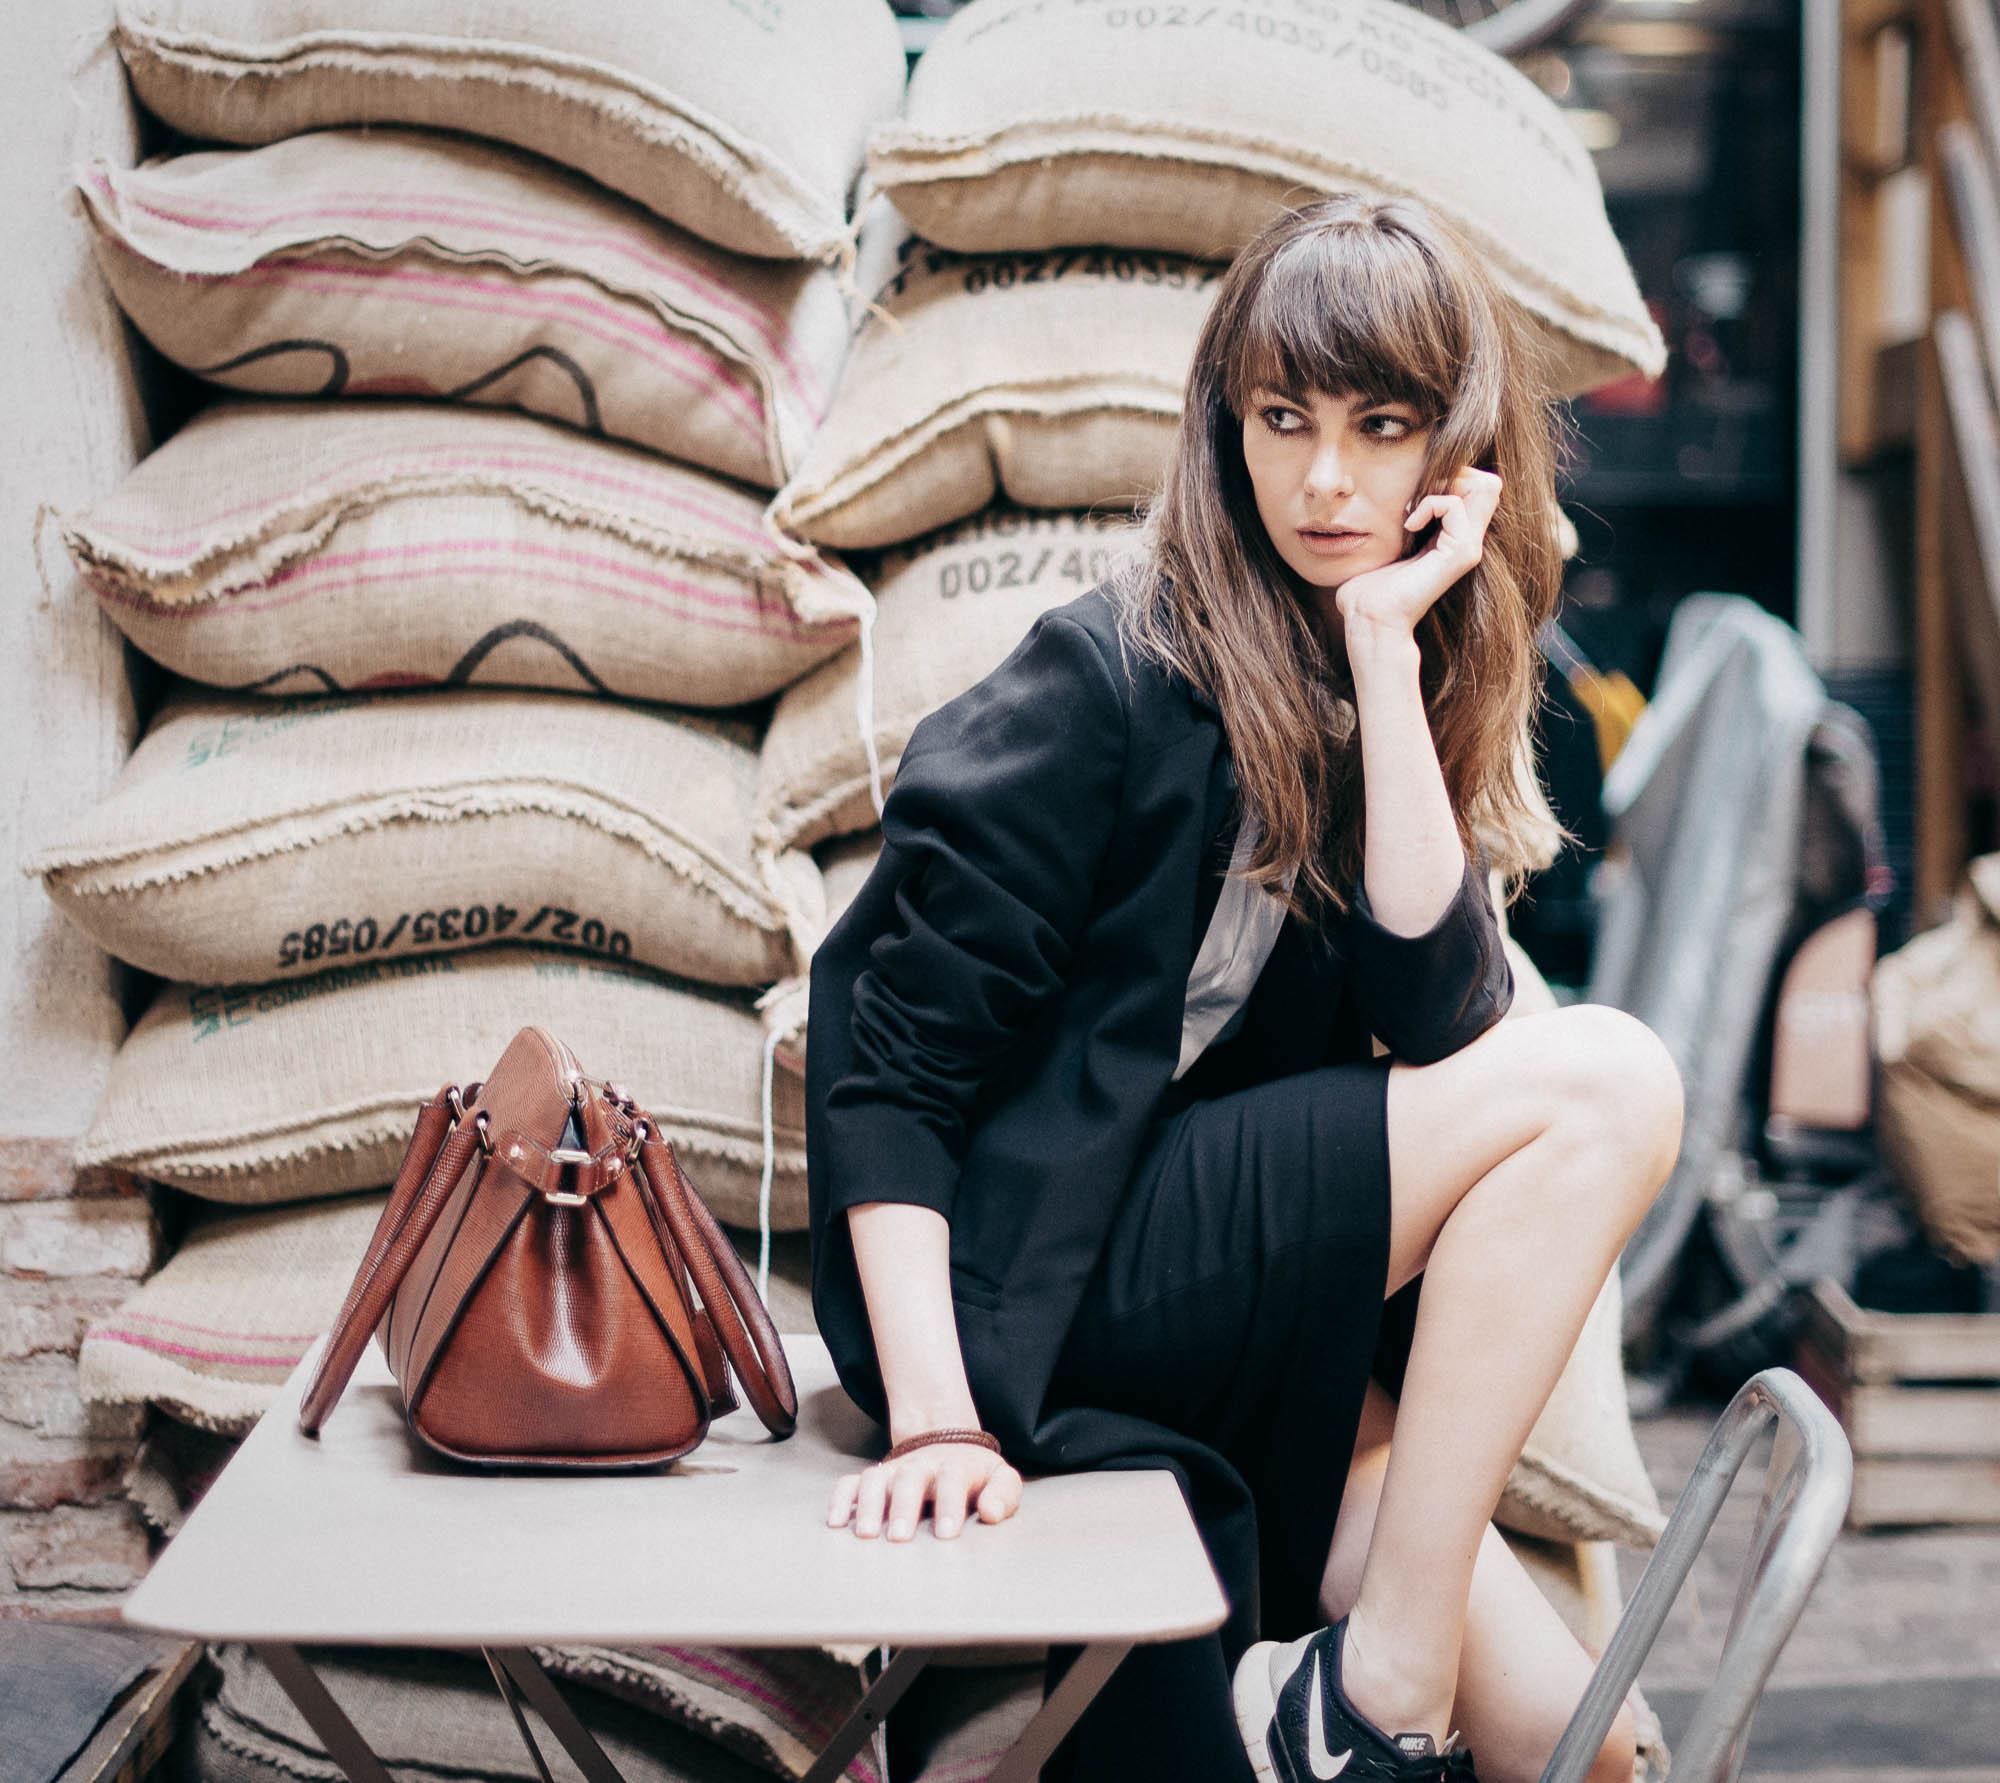 Anna Backe, photo by carlerikjonas